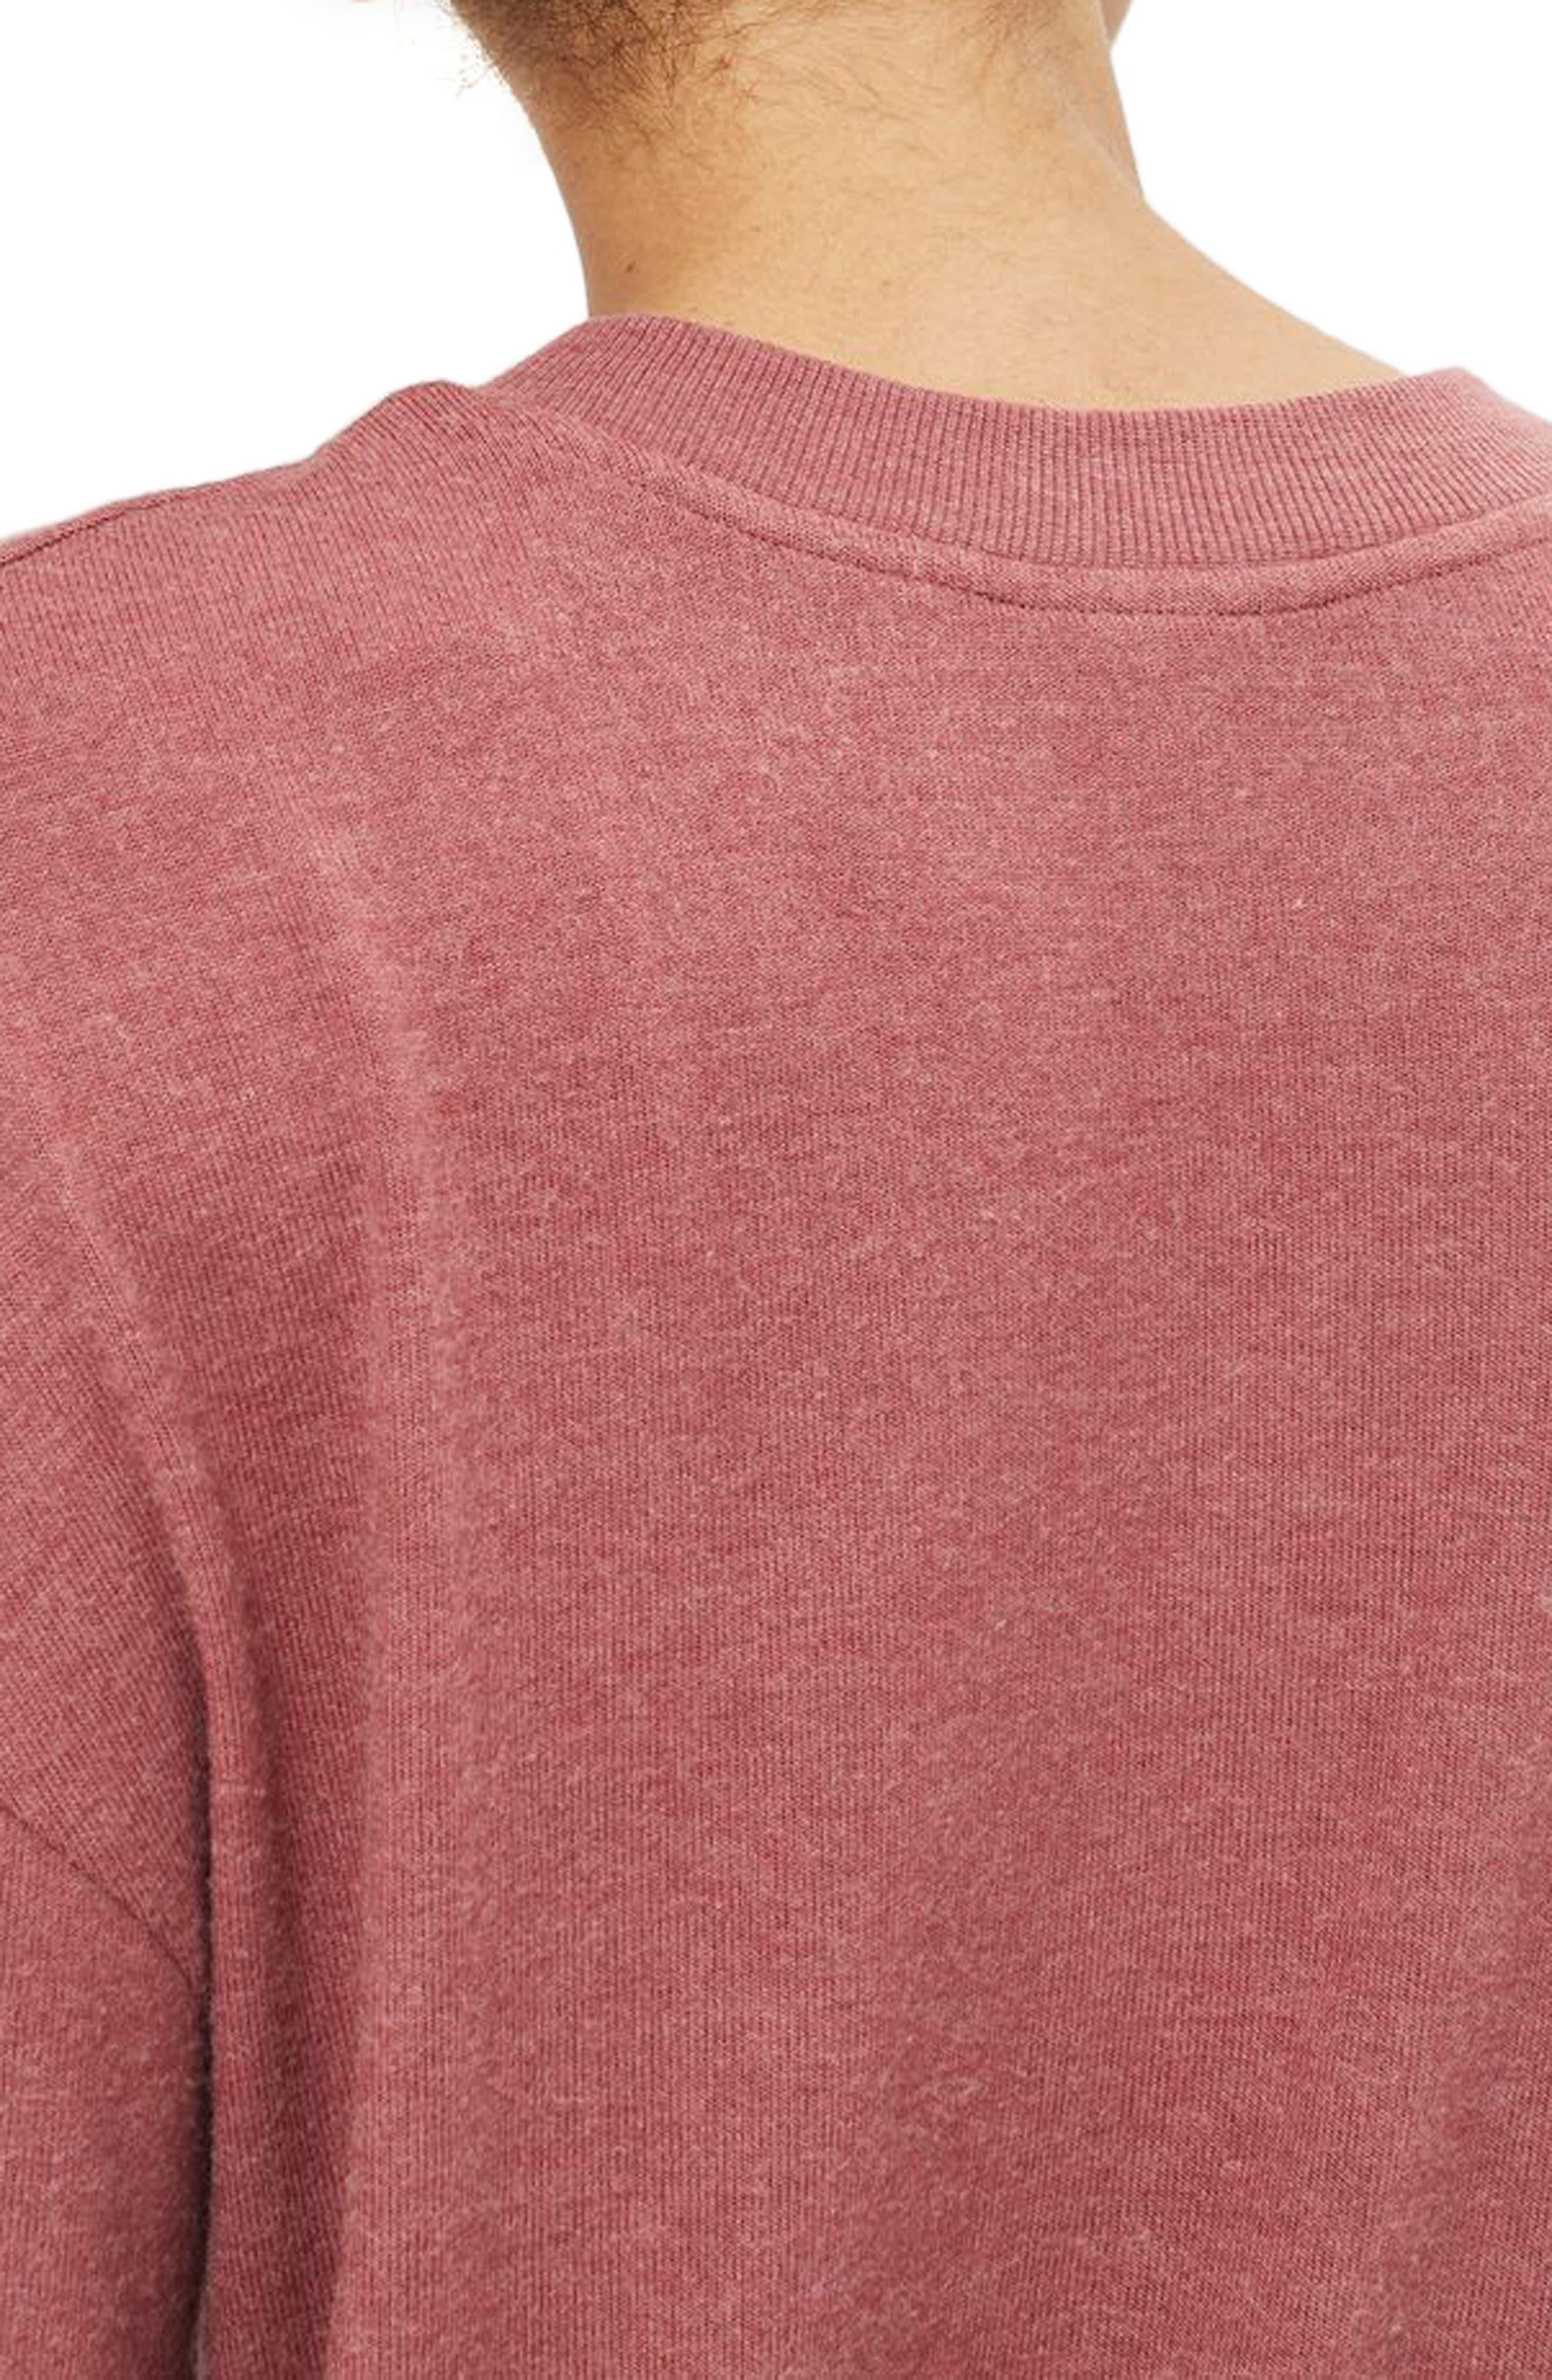 Rose Sweatshirt,                             Alternate thumbnail 2, color,                             650